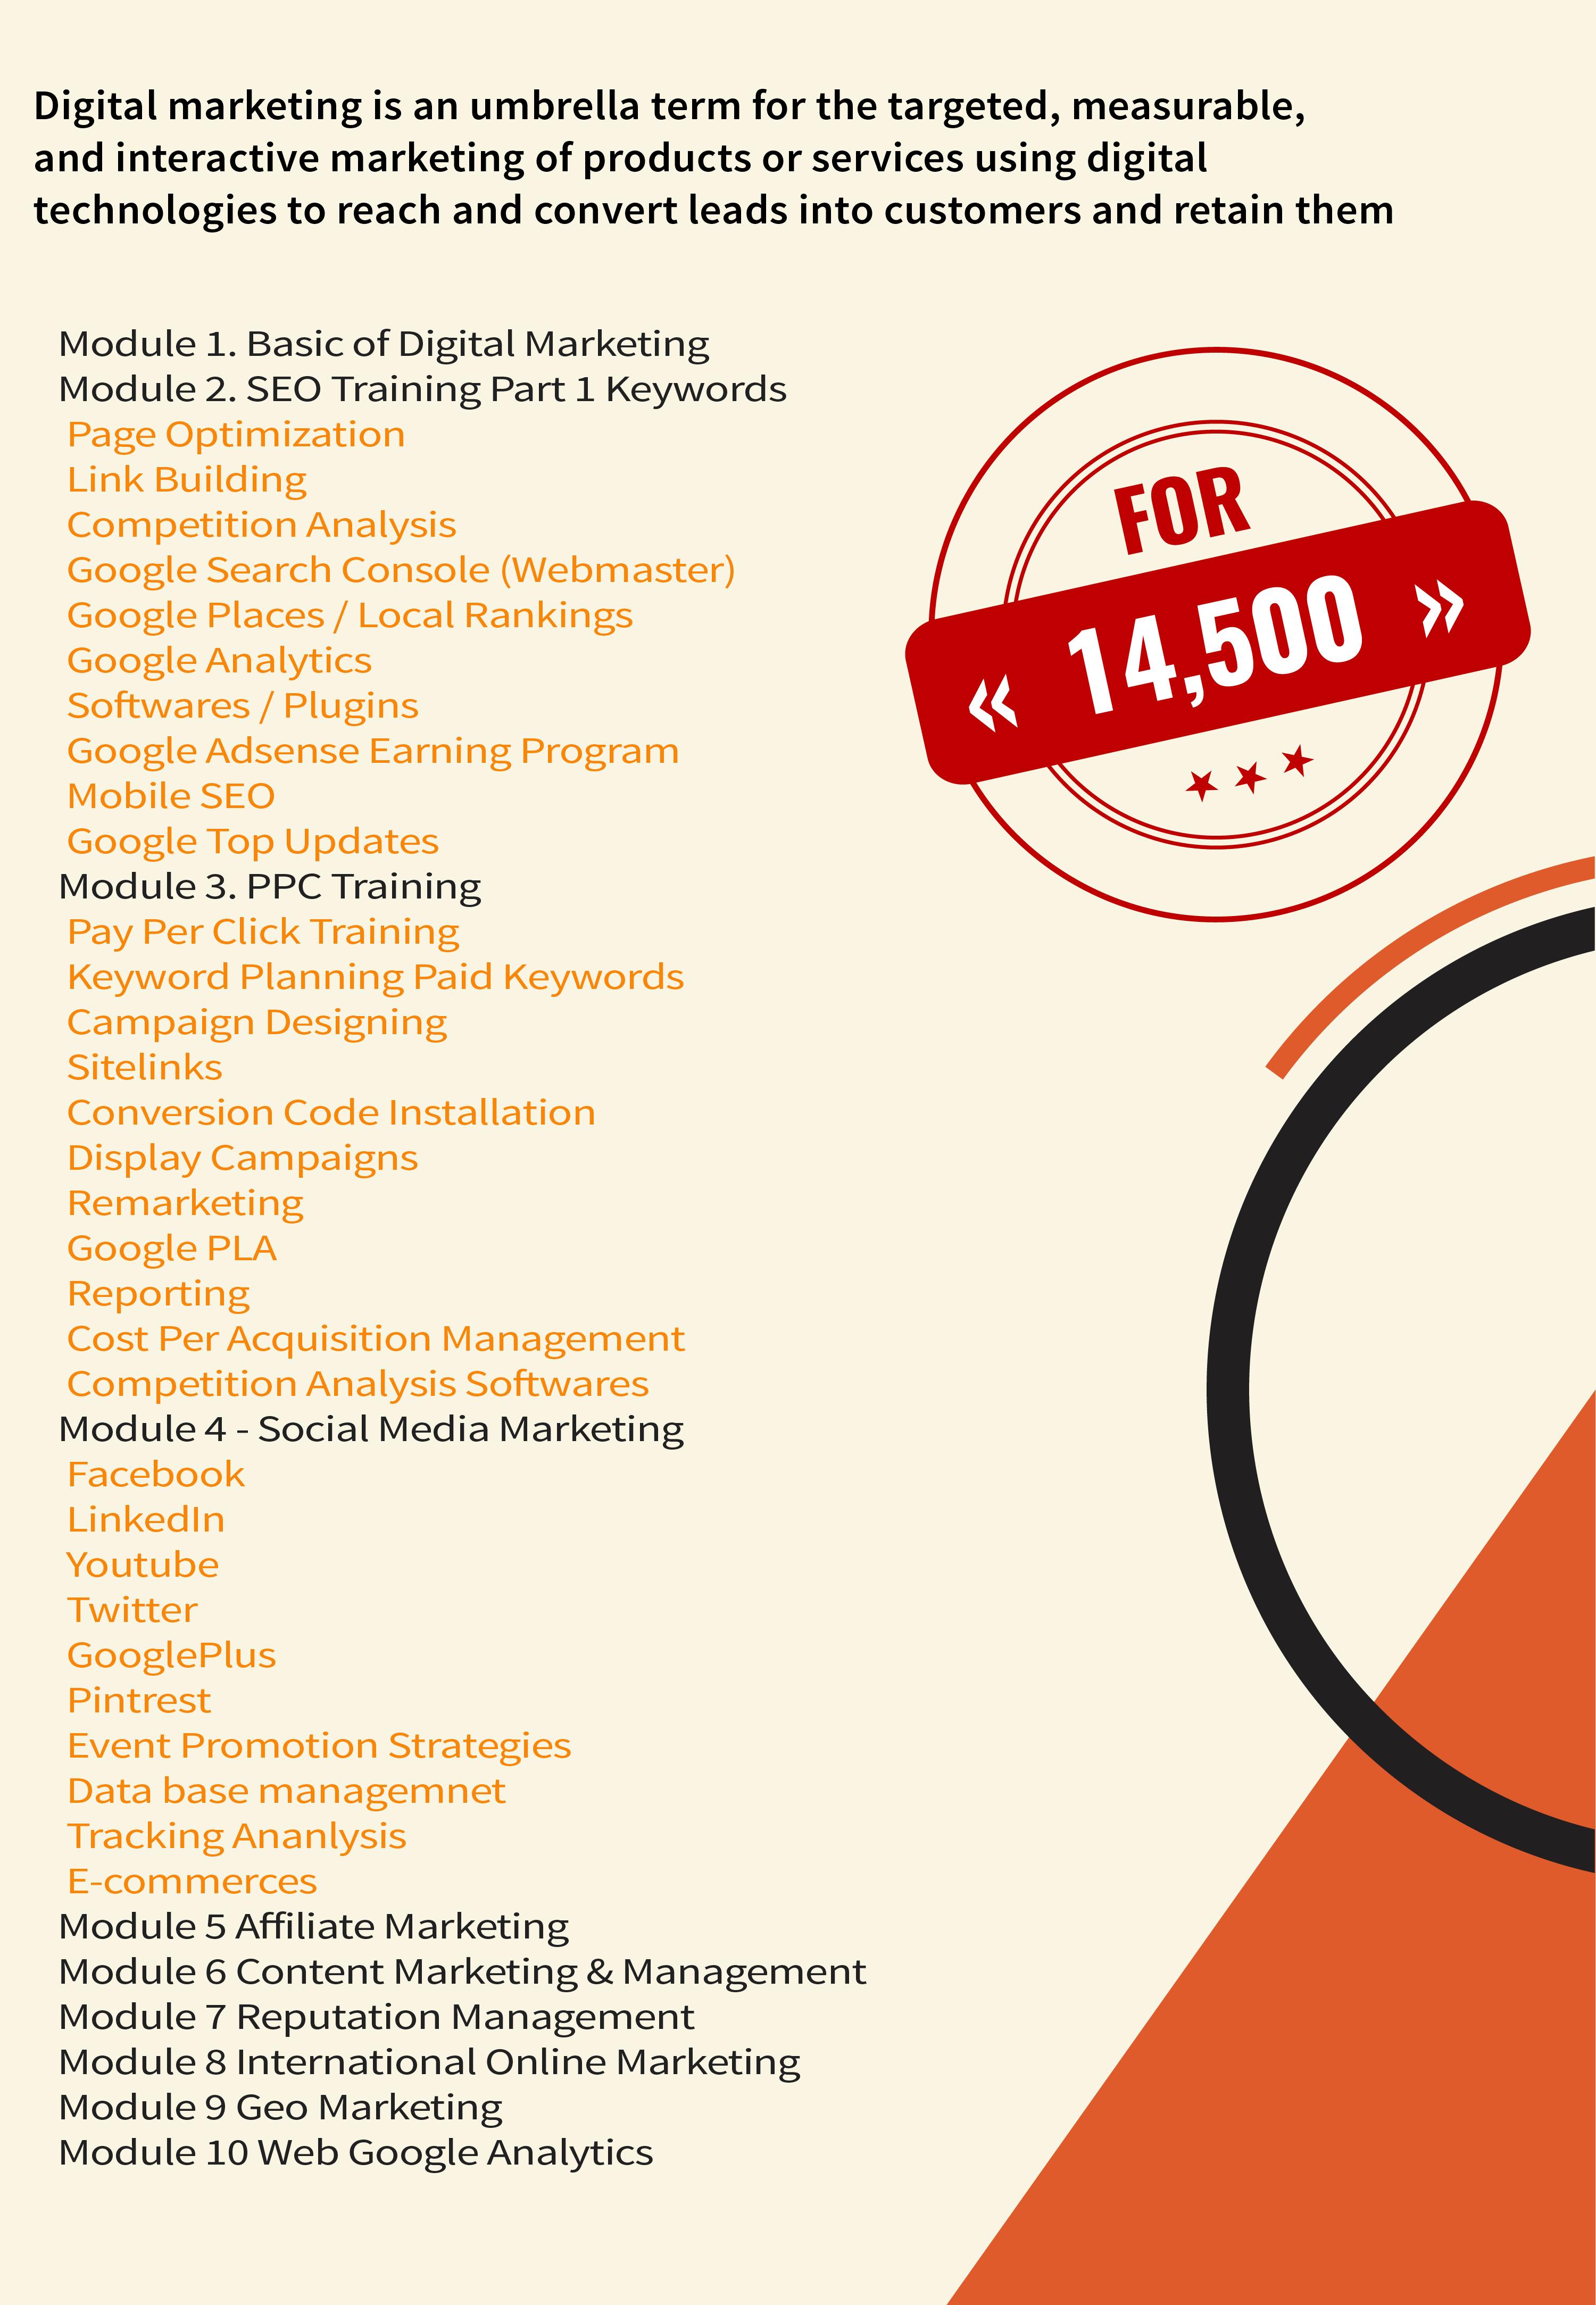 Digital Marketing Course Modules